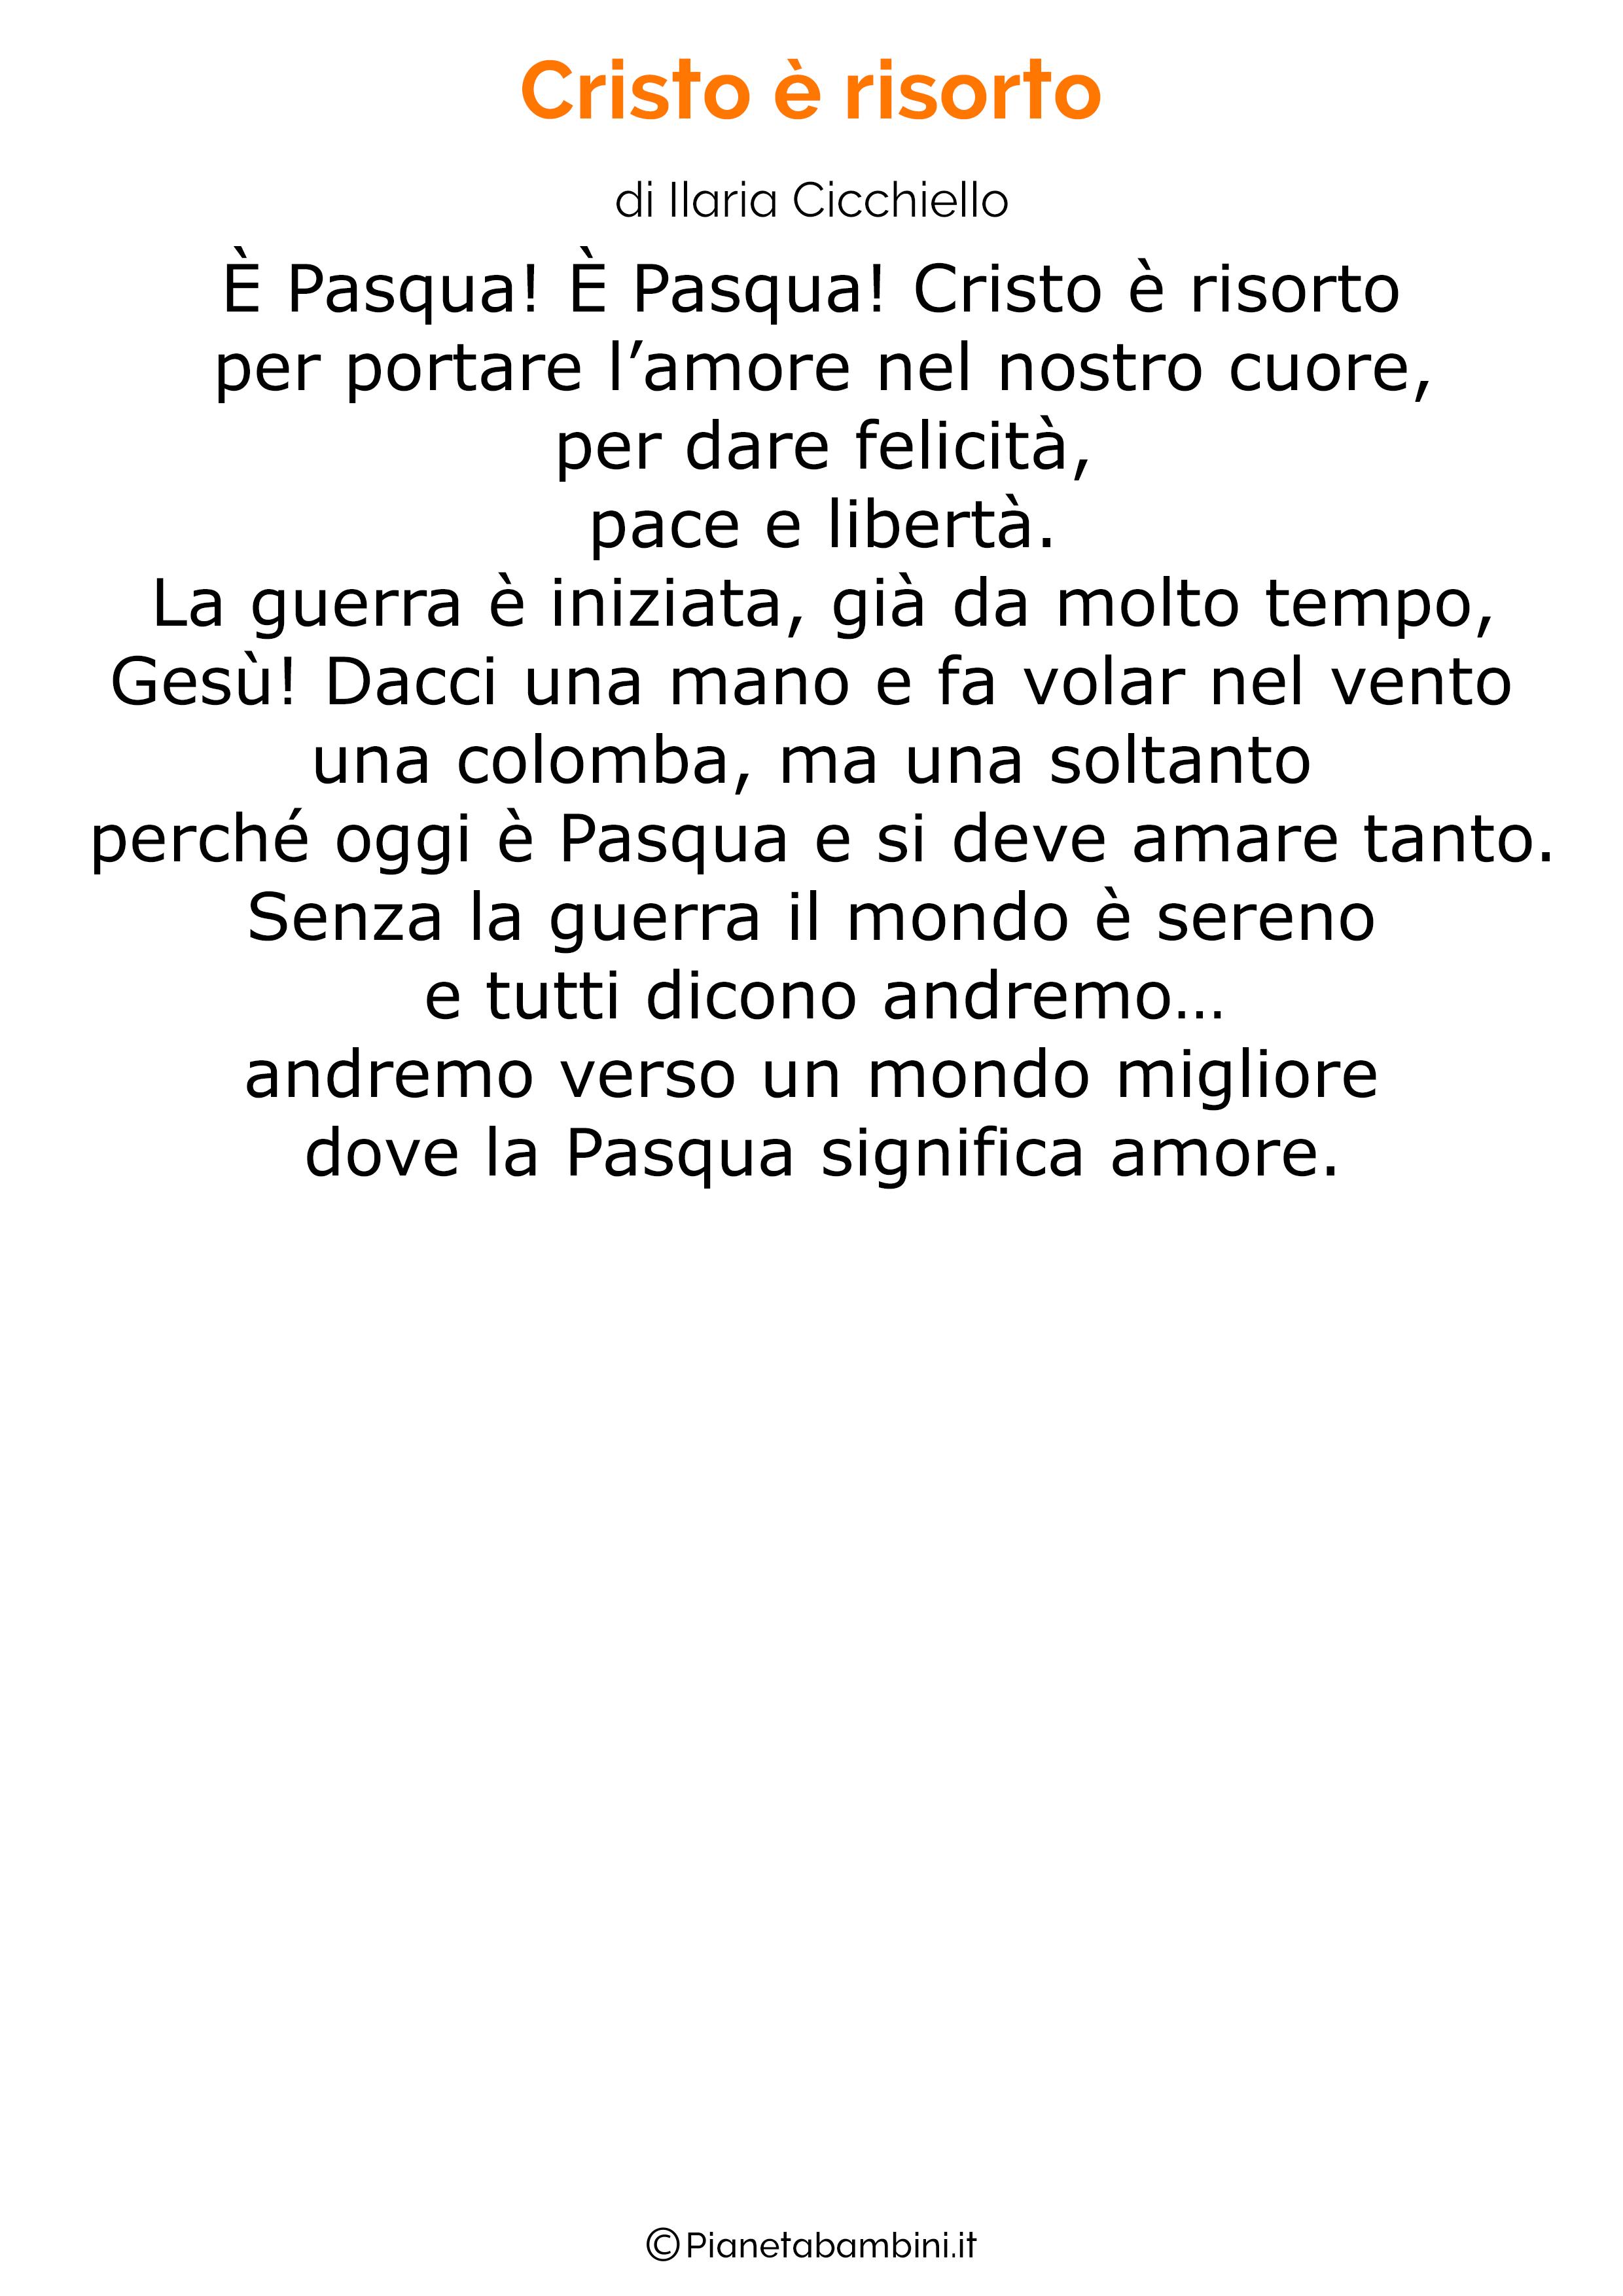 Poesia di Pasqua 45